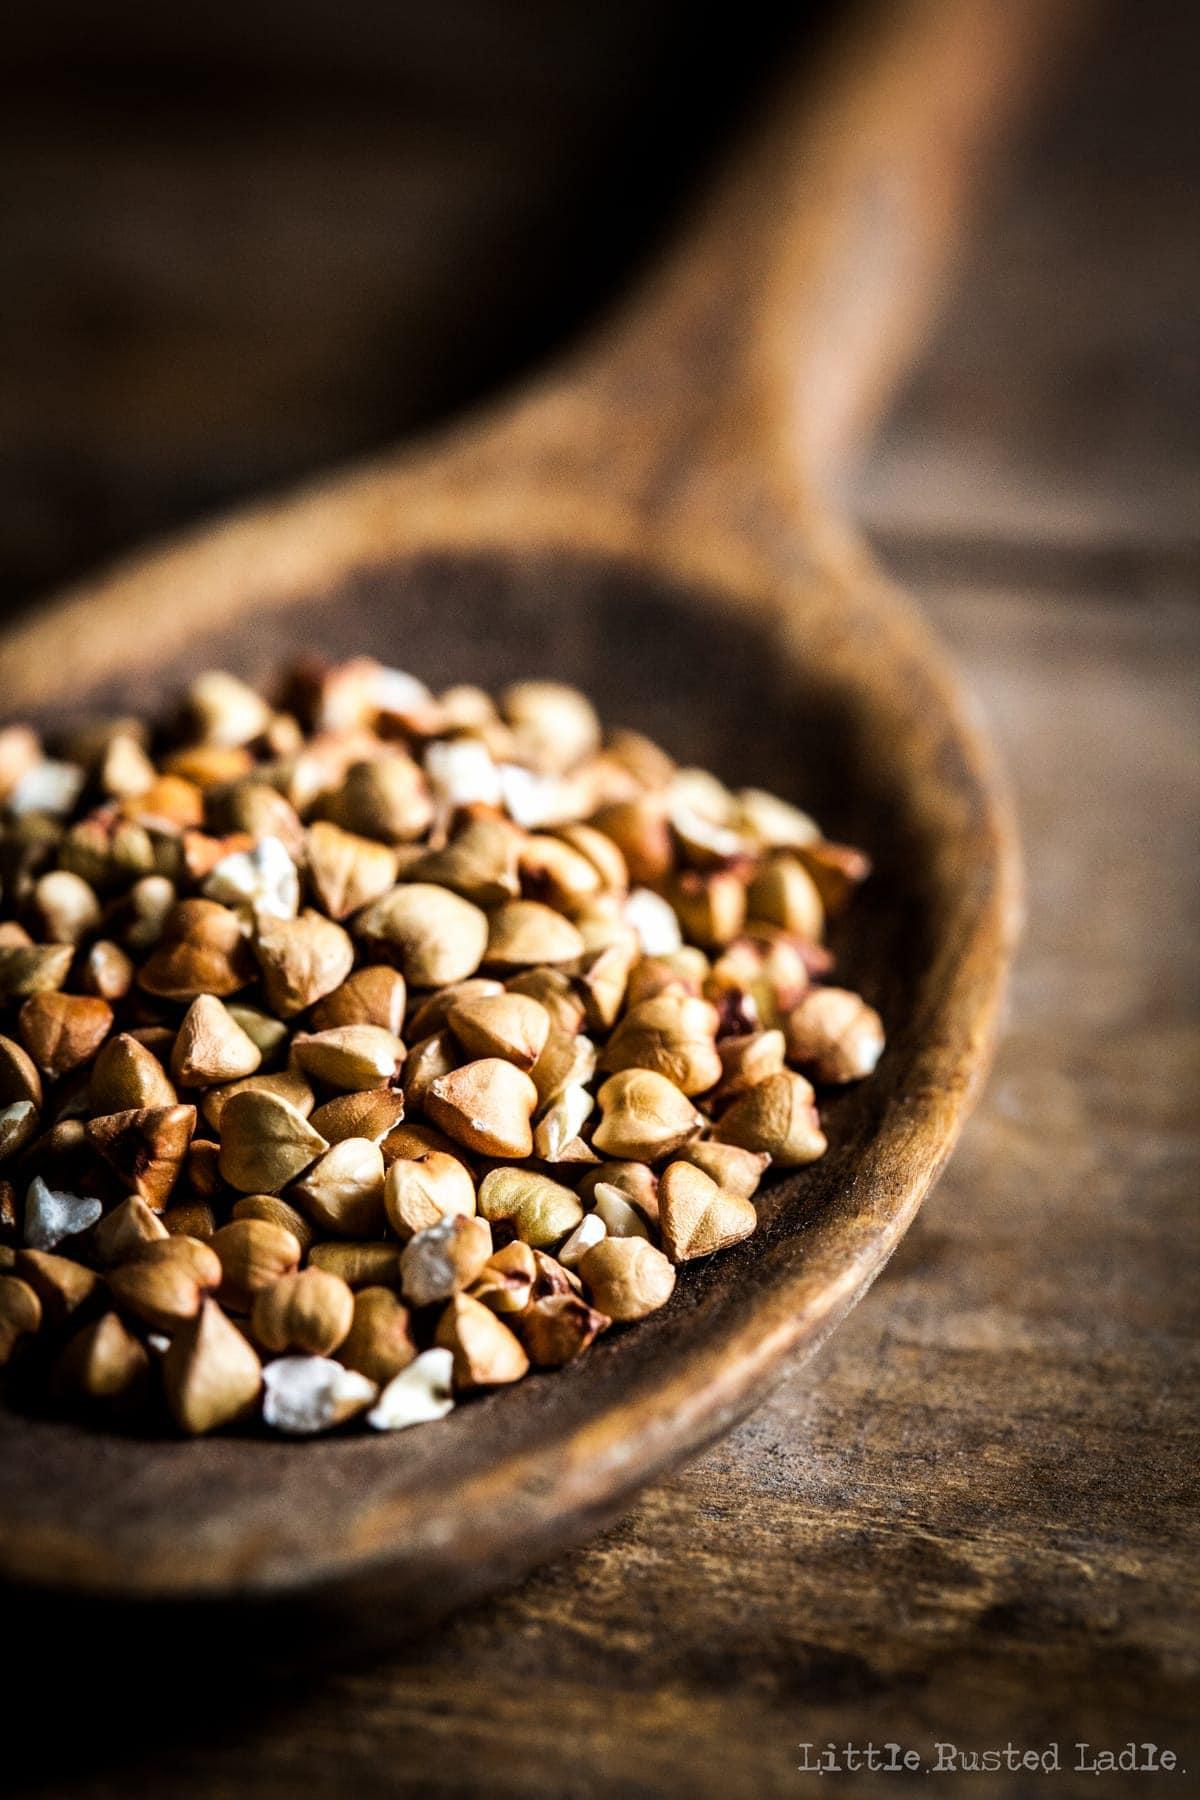 Buckwheat Breakfest Soufflés - Ancient Grains - Little Rusted Ladle - 0010-96